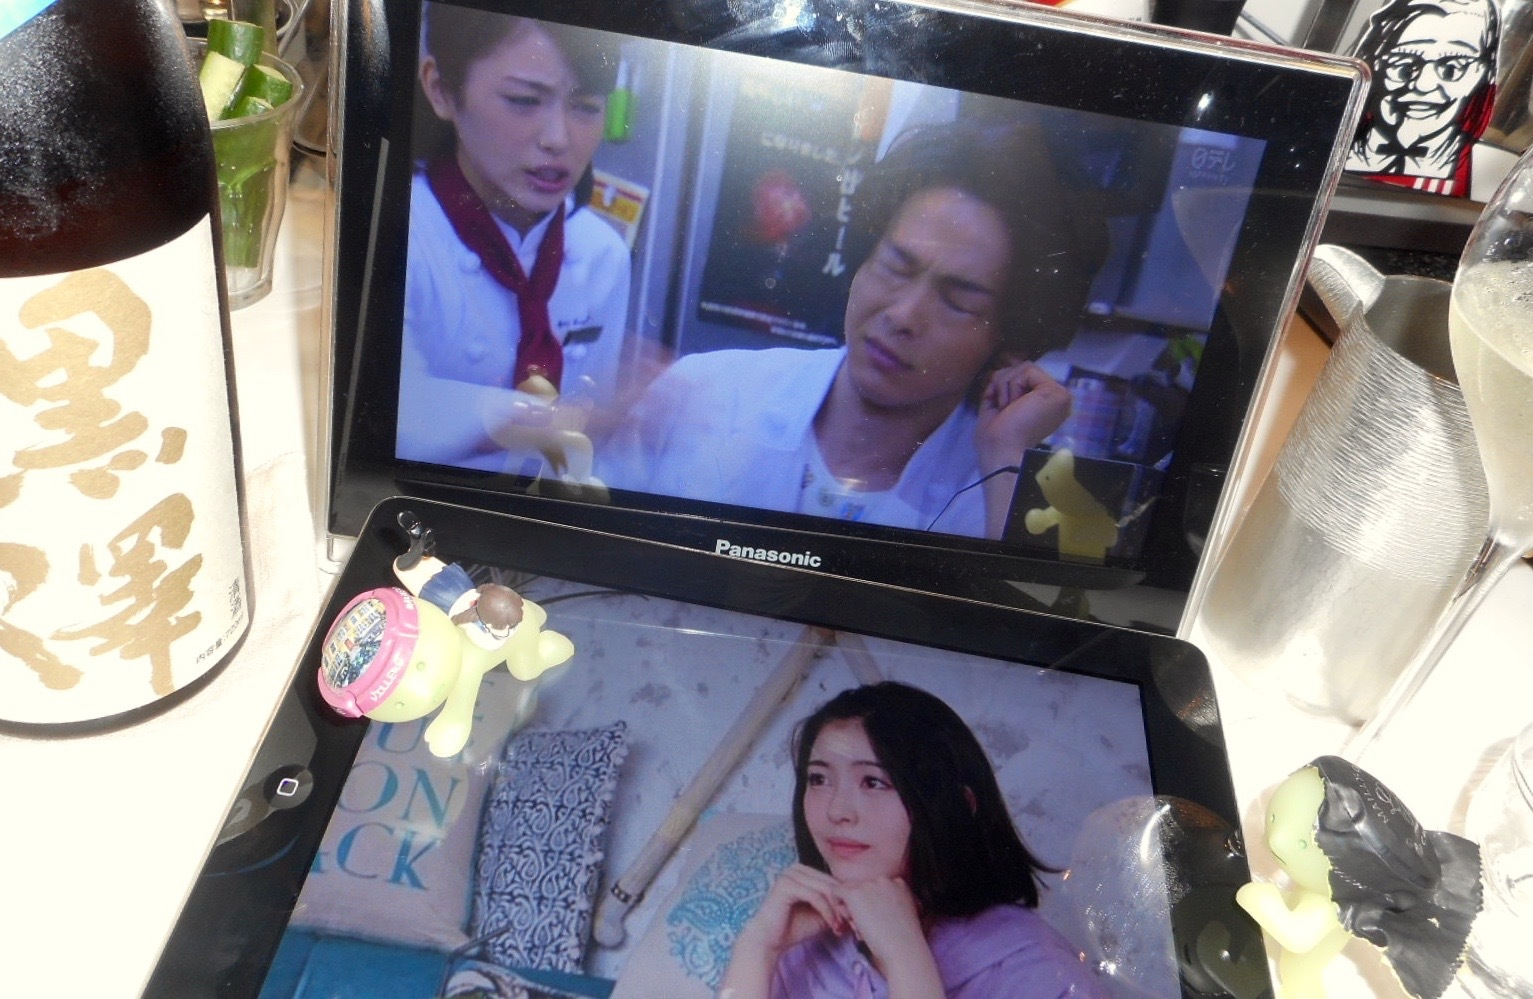 kurosawa_hozumi29by5.jpg